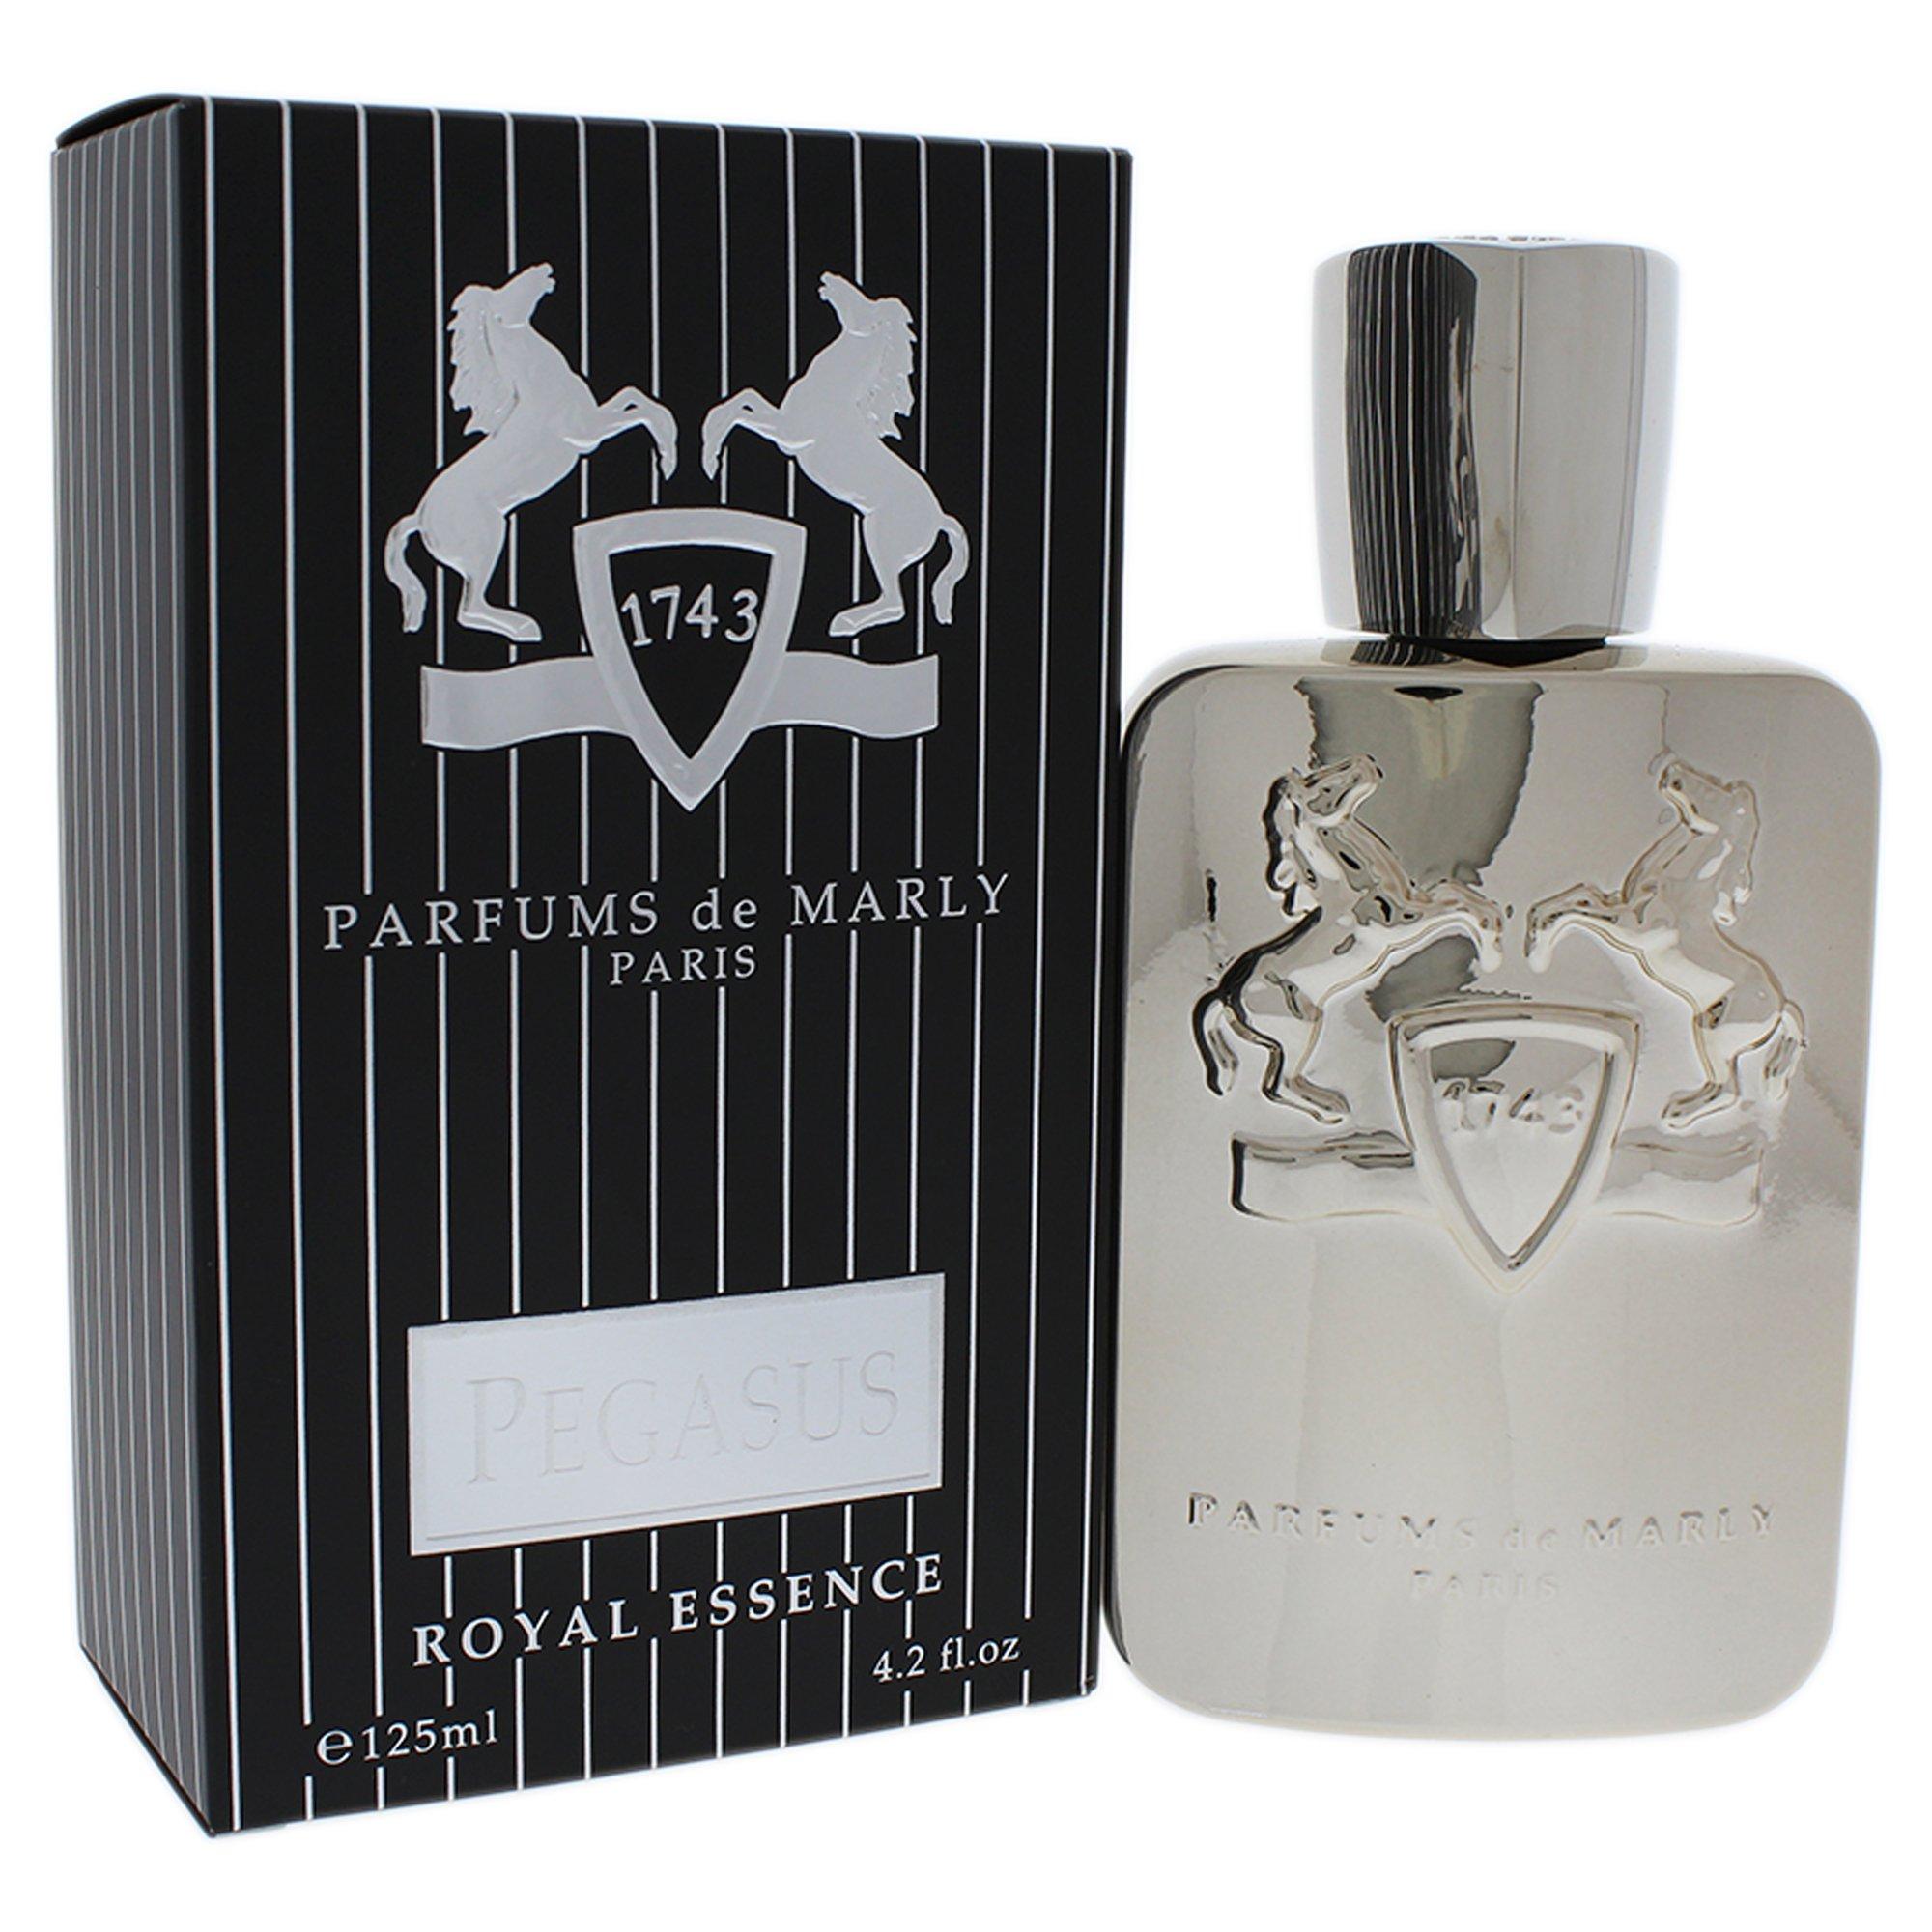 Parfums de Marly Pegasus Men's EDP Spray, 4.2 oz.